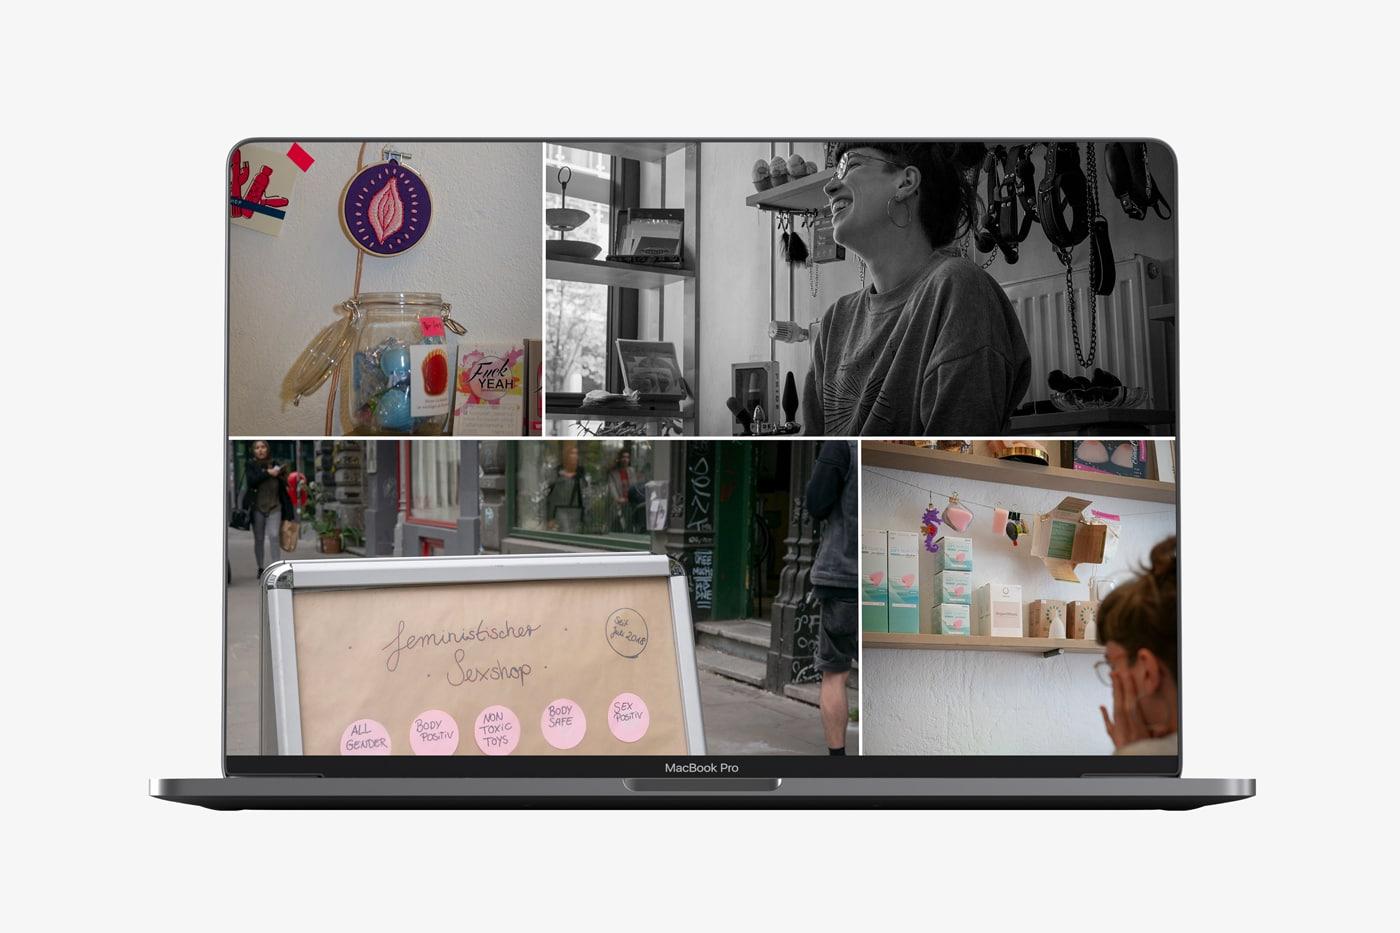 Screendesign Sexshop-Kollektiv, Portresie de femme